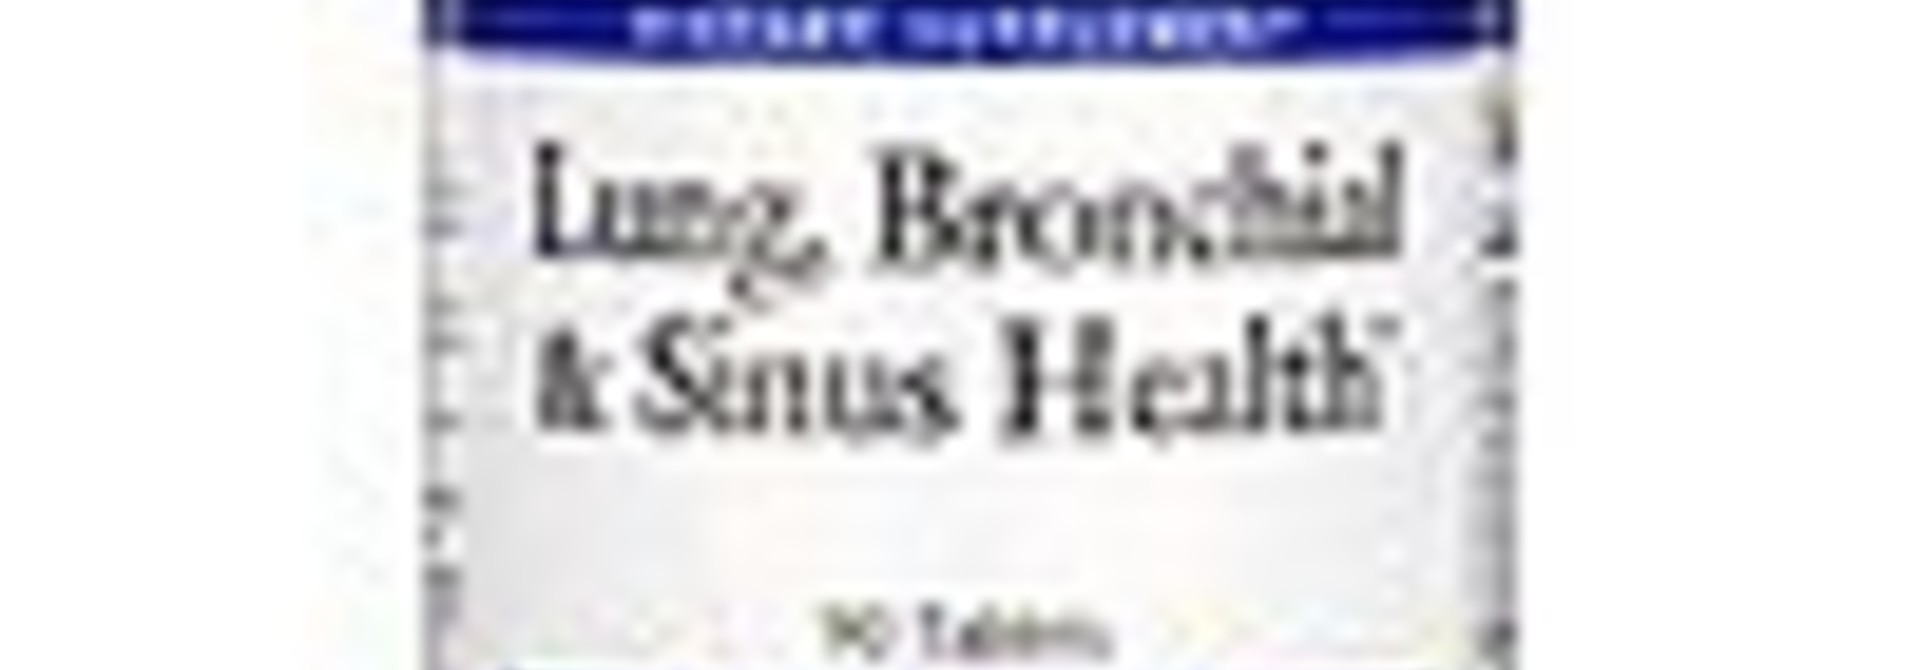 LUNG, BRONCHIAL, & SINUS HEALTH 90CT